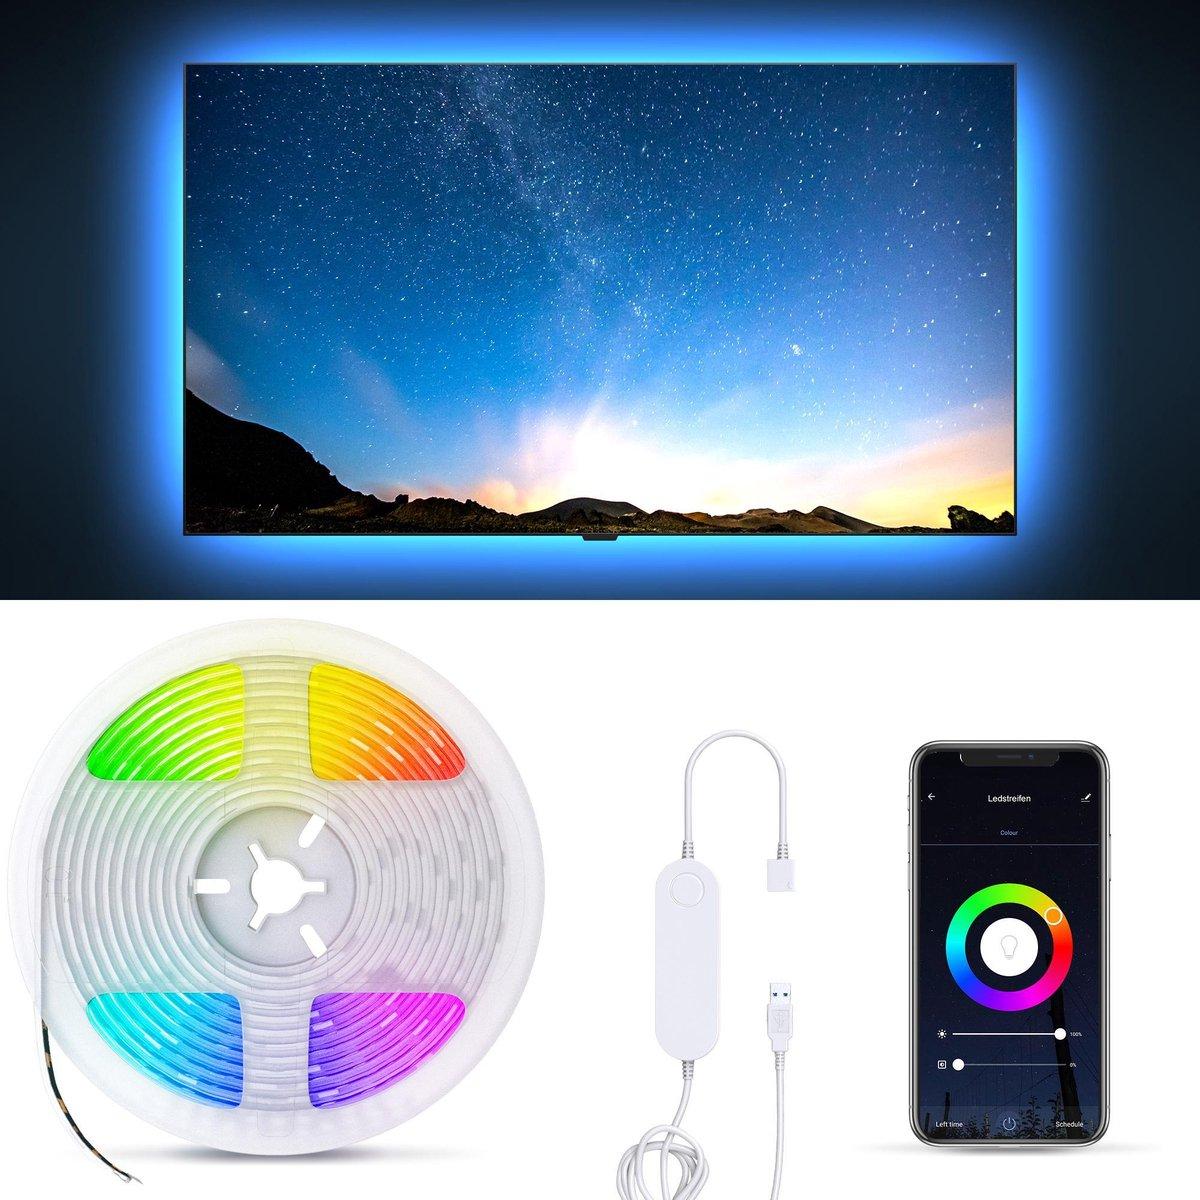 B.K.Licht - LED Strip smart - 2 meter - voor TV en PC - WiFi - App controle - USB - zwart - siliconencoating - zelfklevend